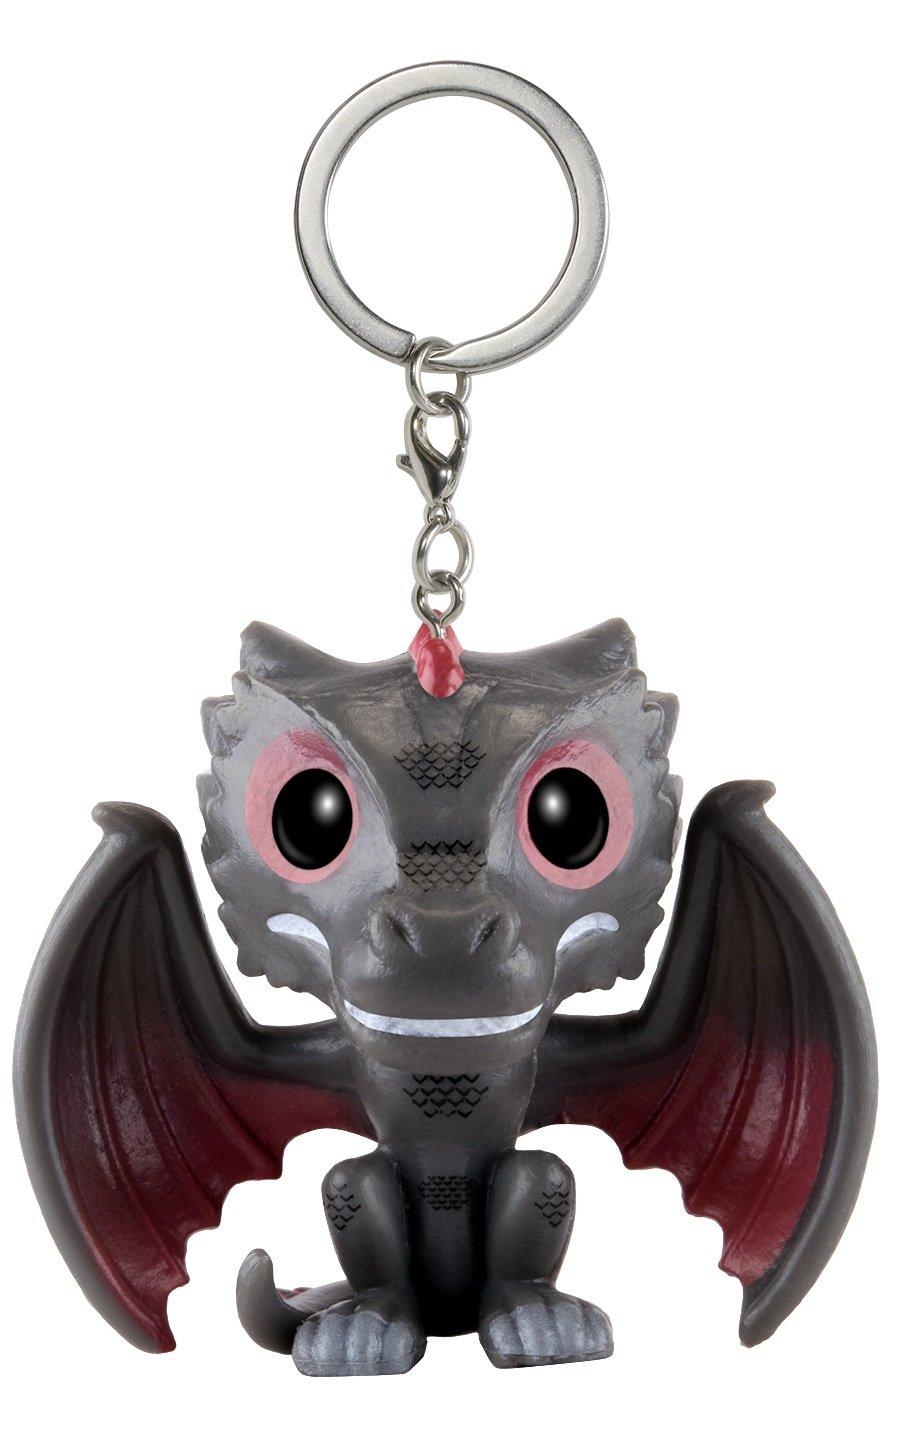 Funko Pocket Game of Thrones - Drogon Pop Keychain